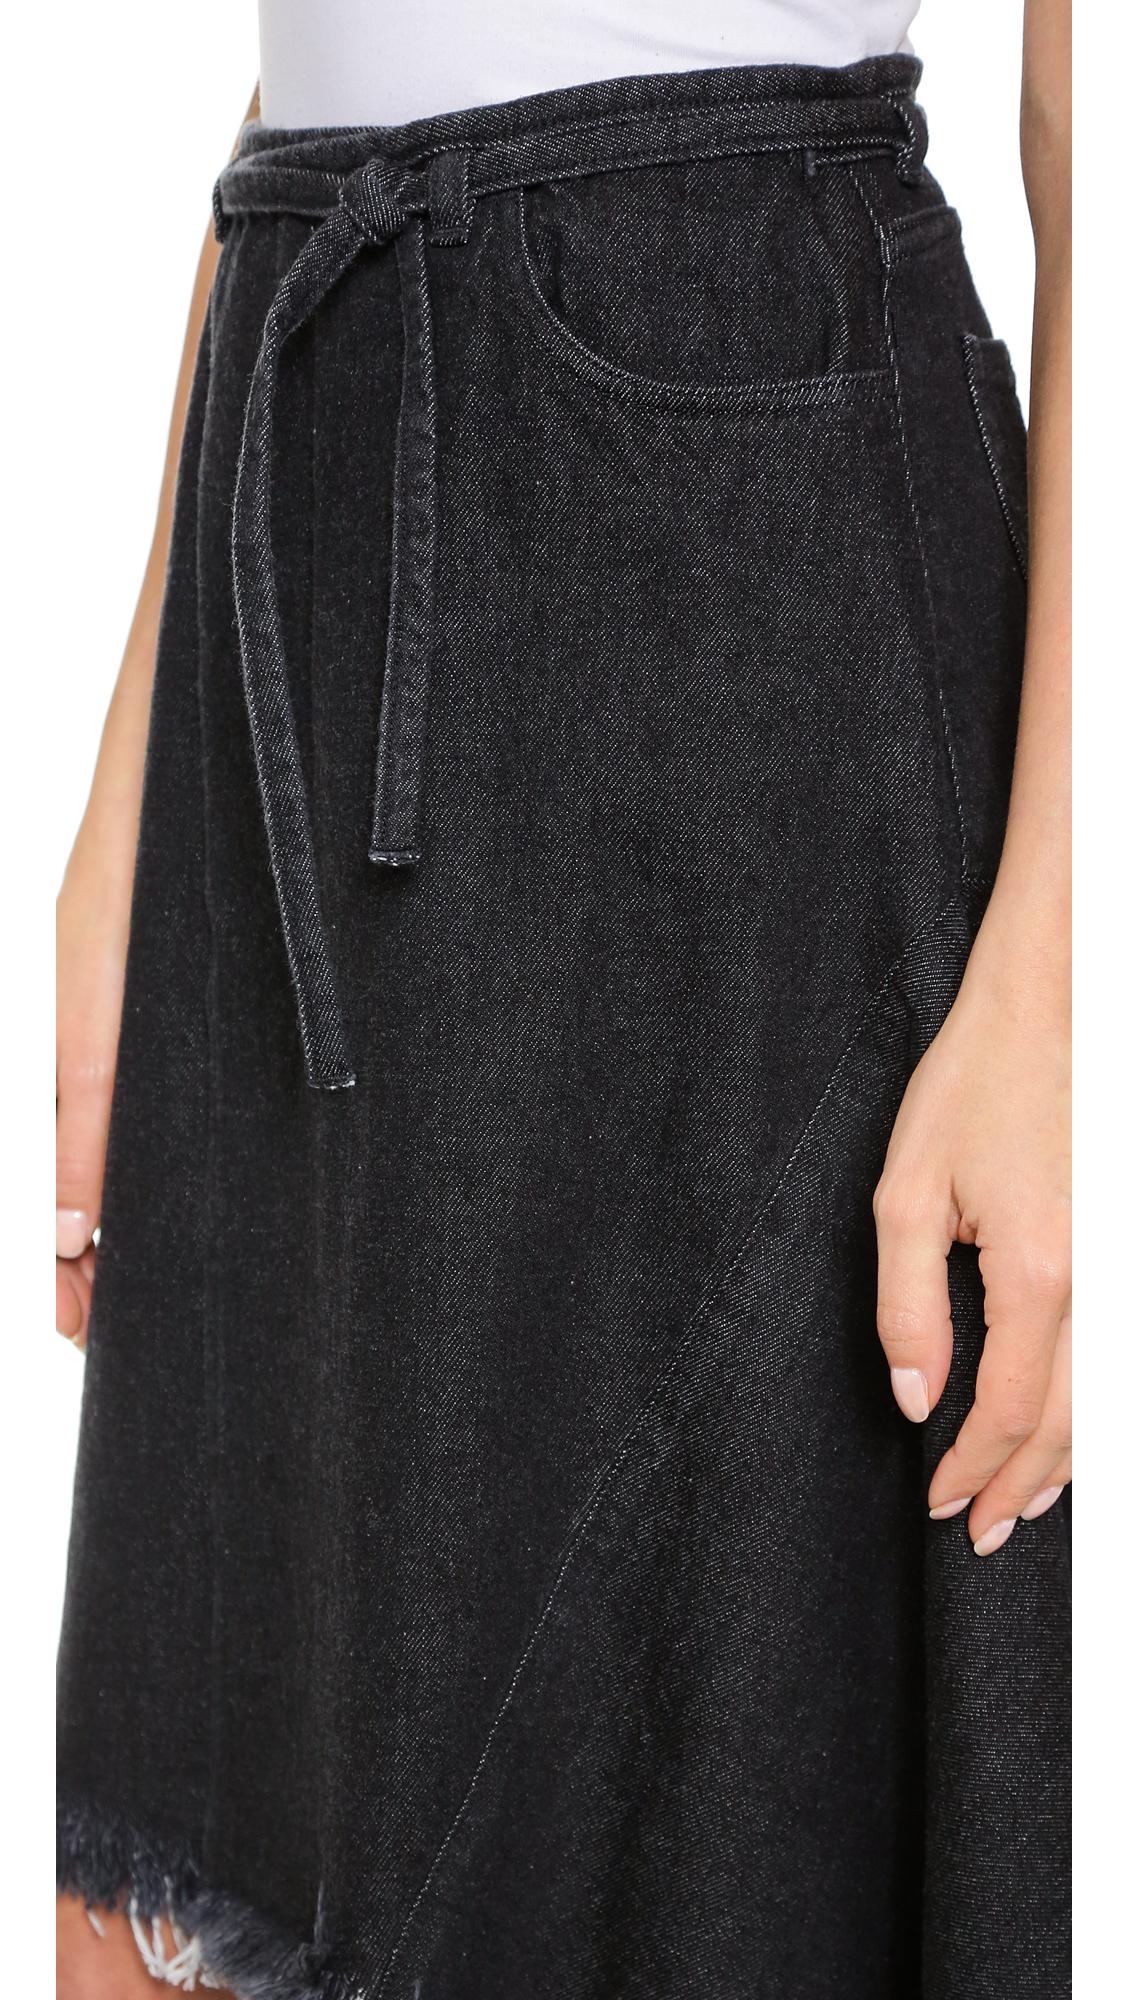 Marques'almeida Denim Wrap Skirt With Frayed Hem - Black/white in ...